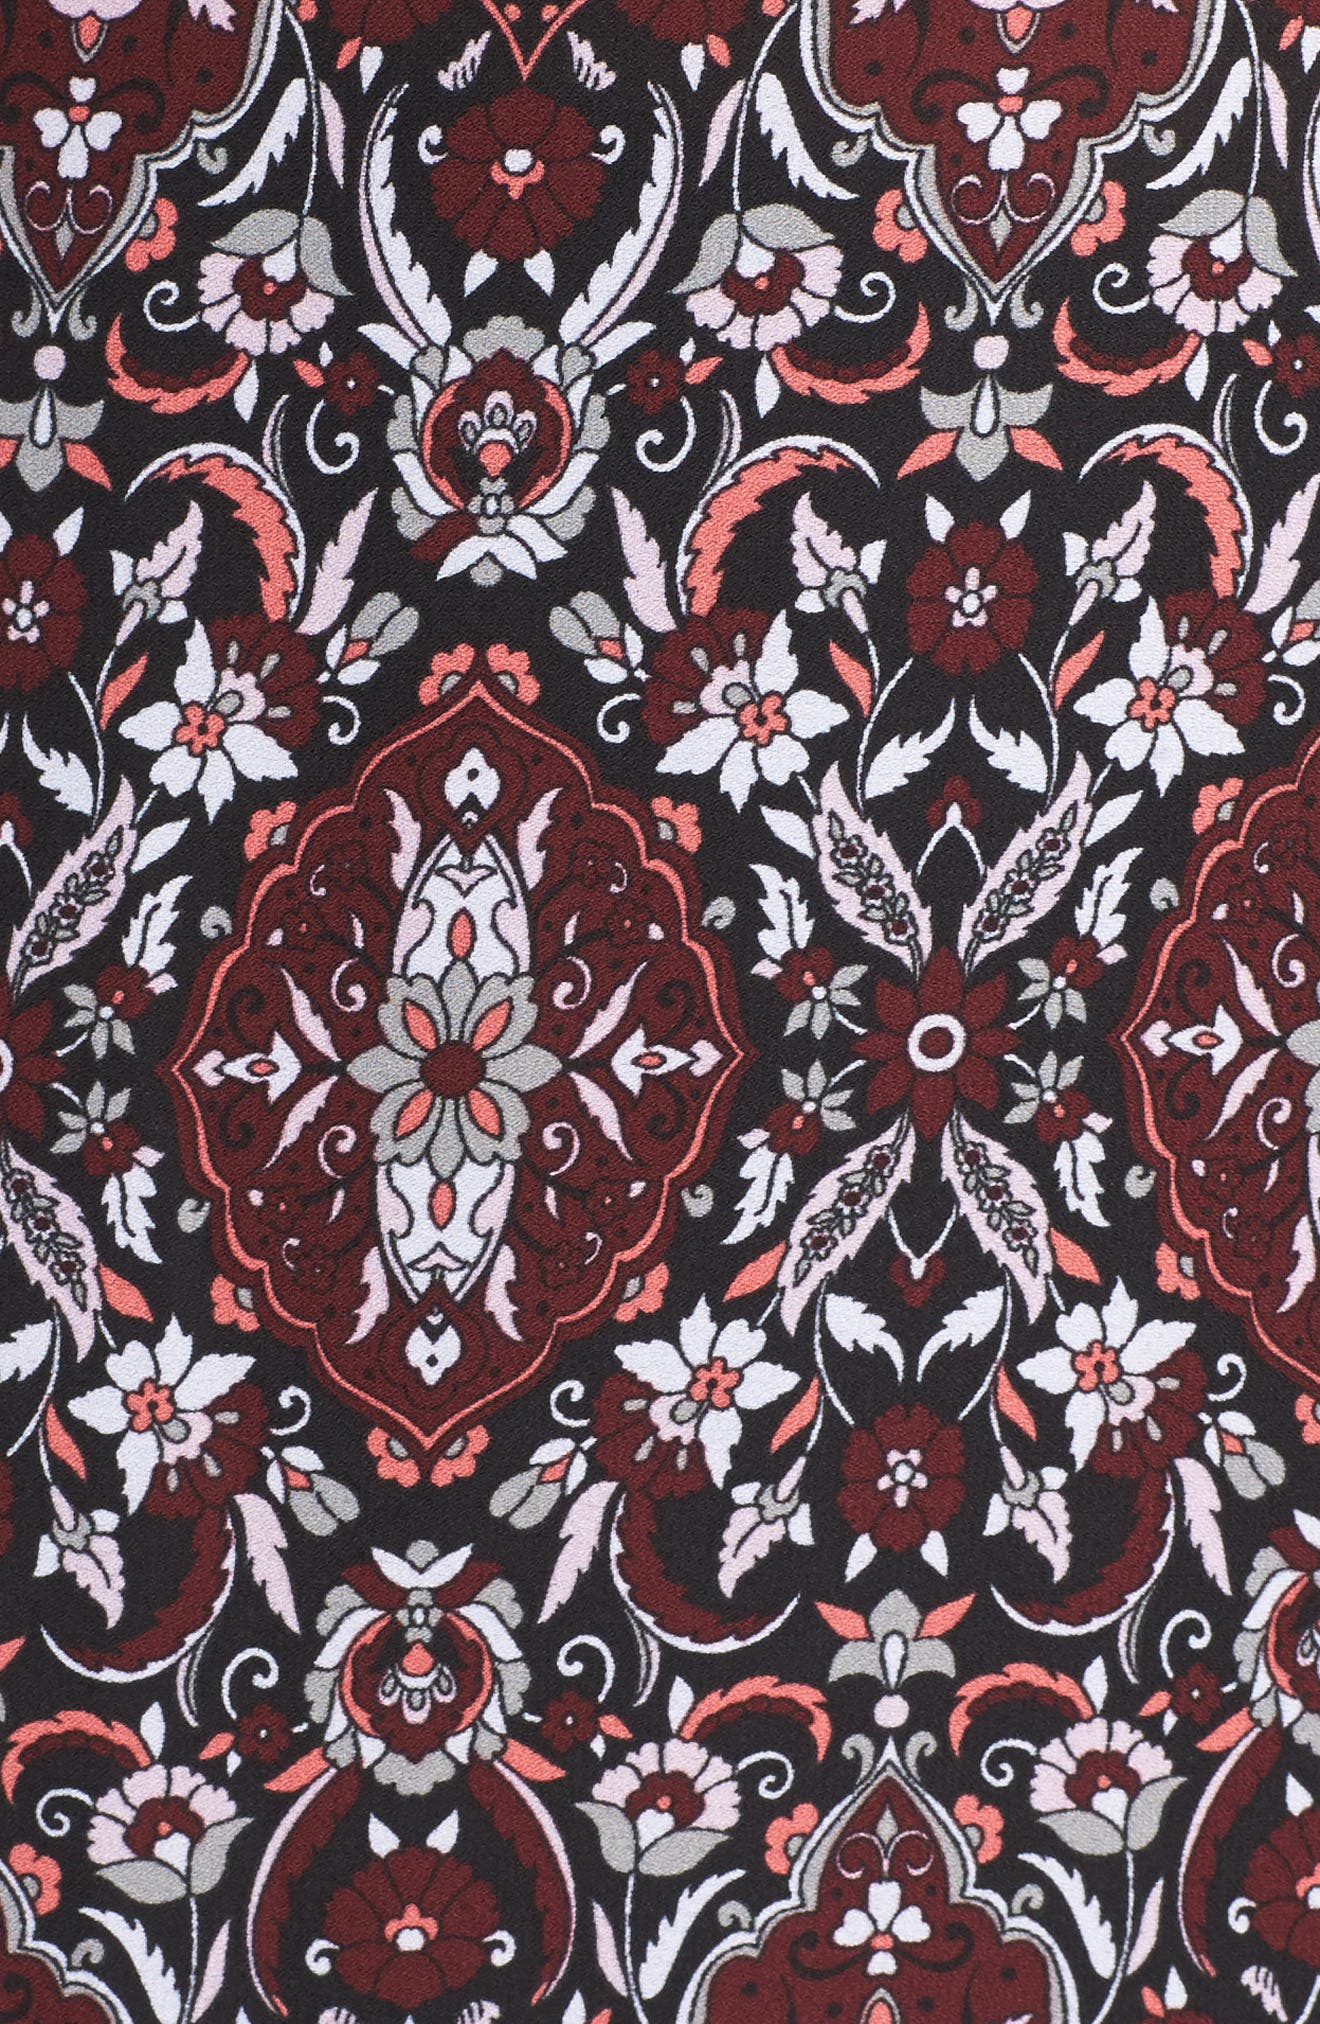 Jade Heirloom Paisley Shirt,                             Alternate thumbnail 5, color,                             602